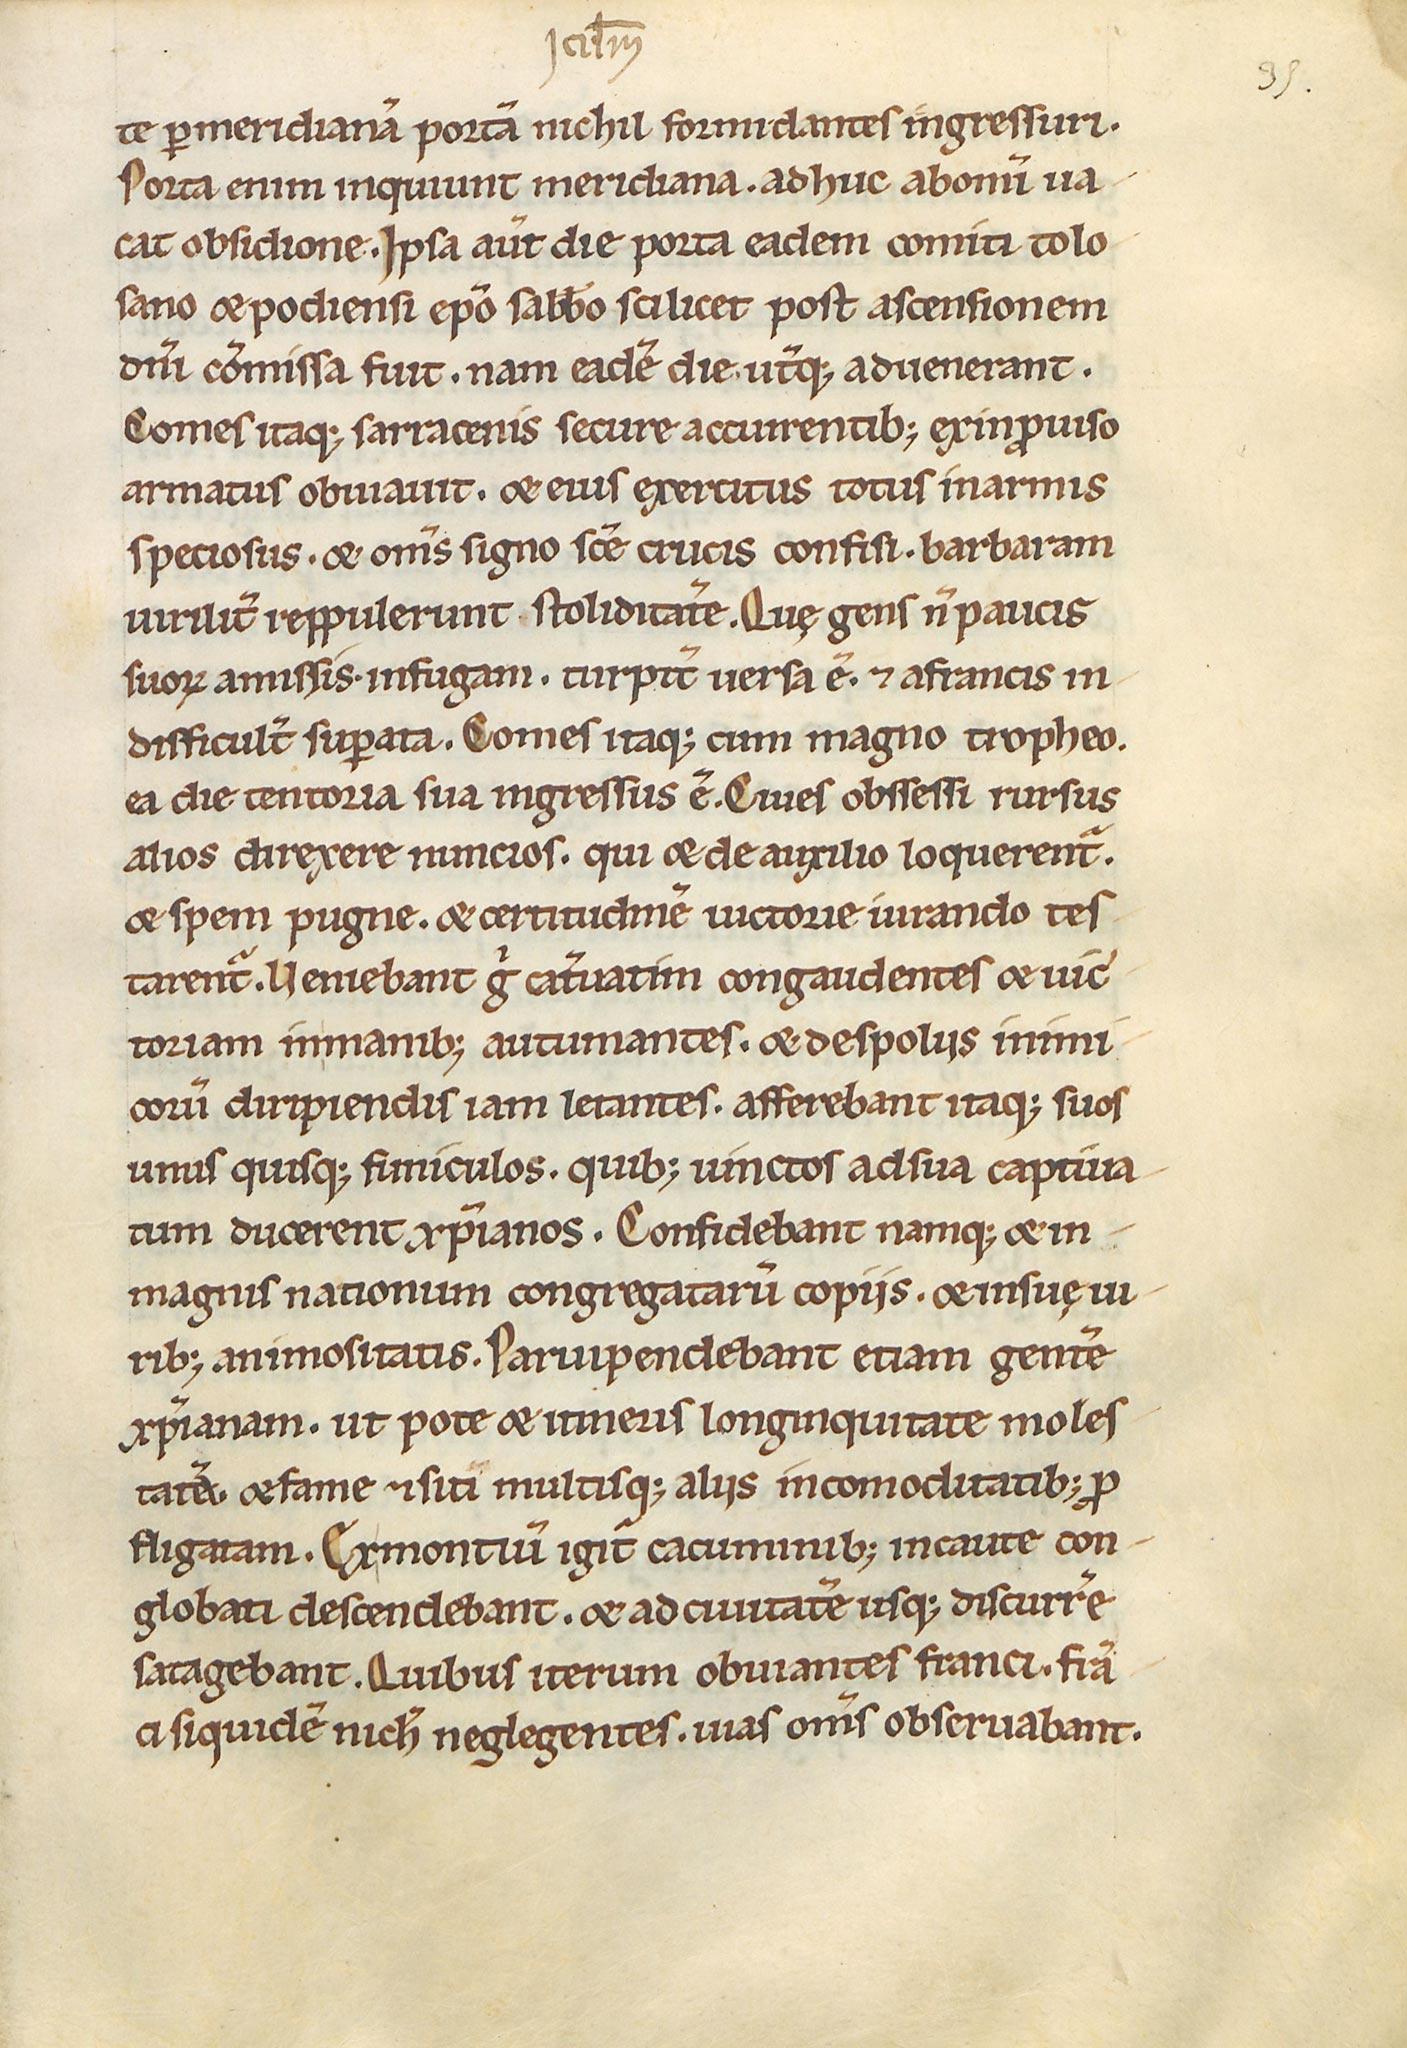 Manuscrit-Historia-Hierosolimitana-35r°